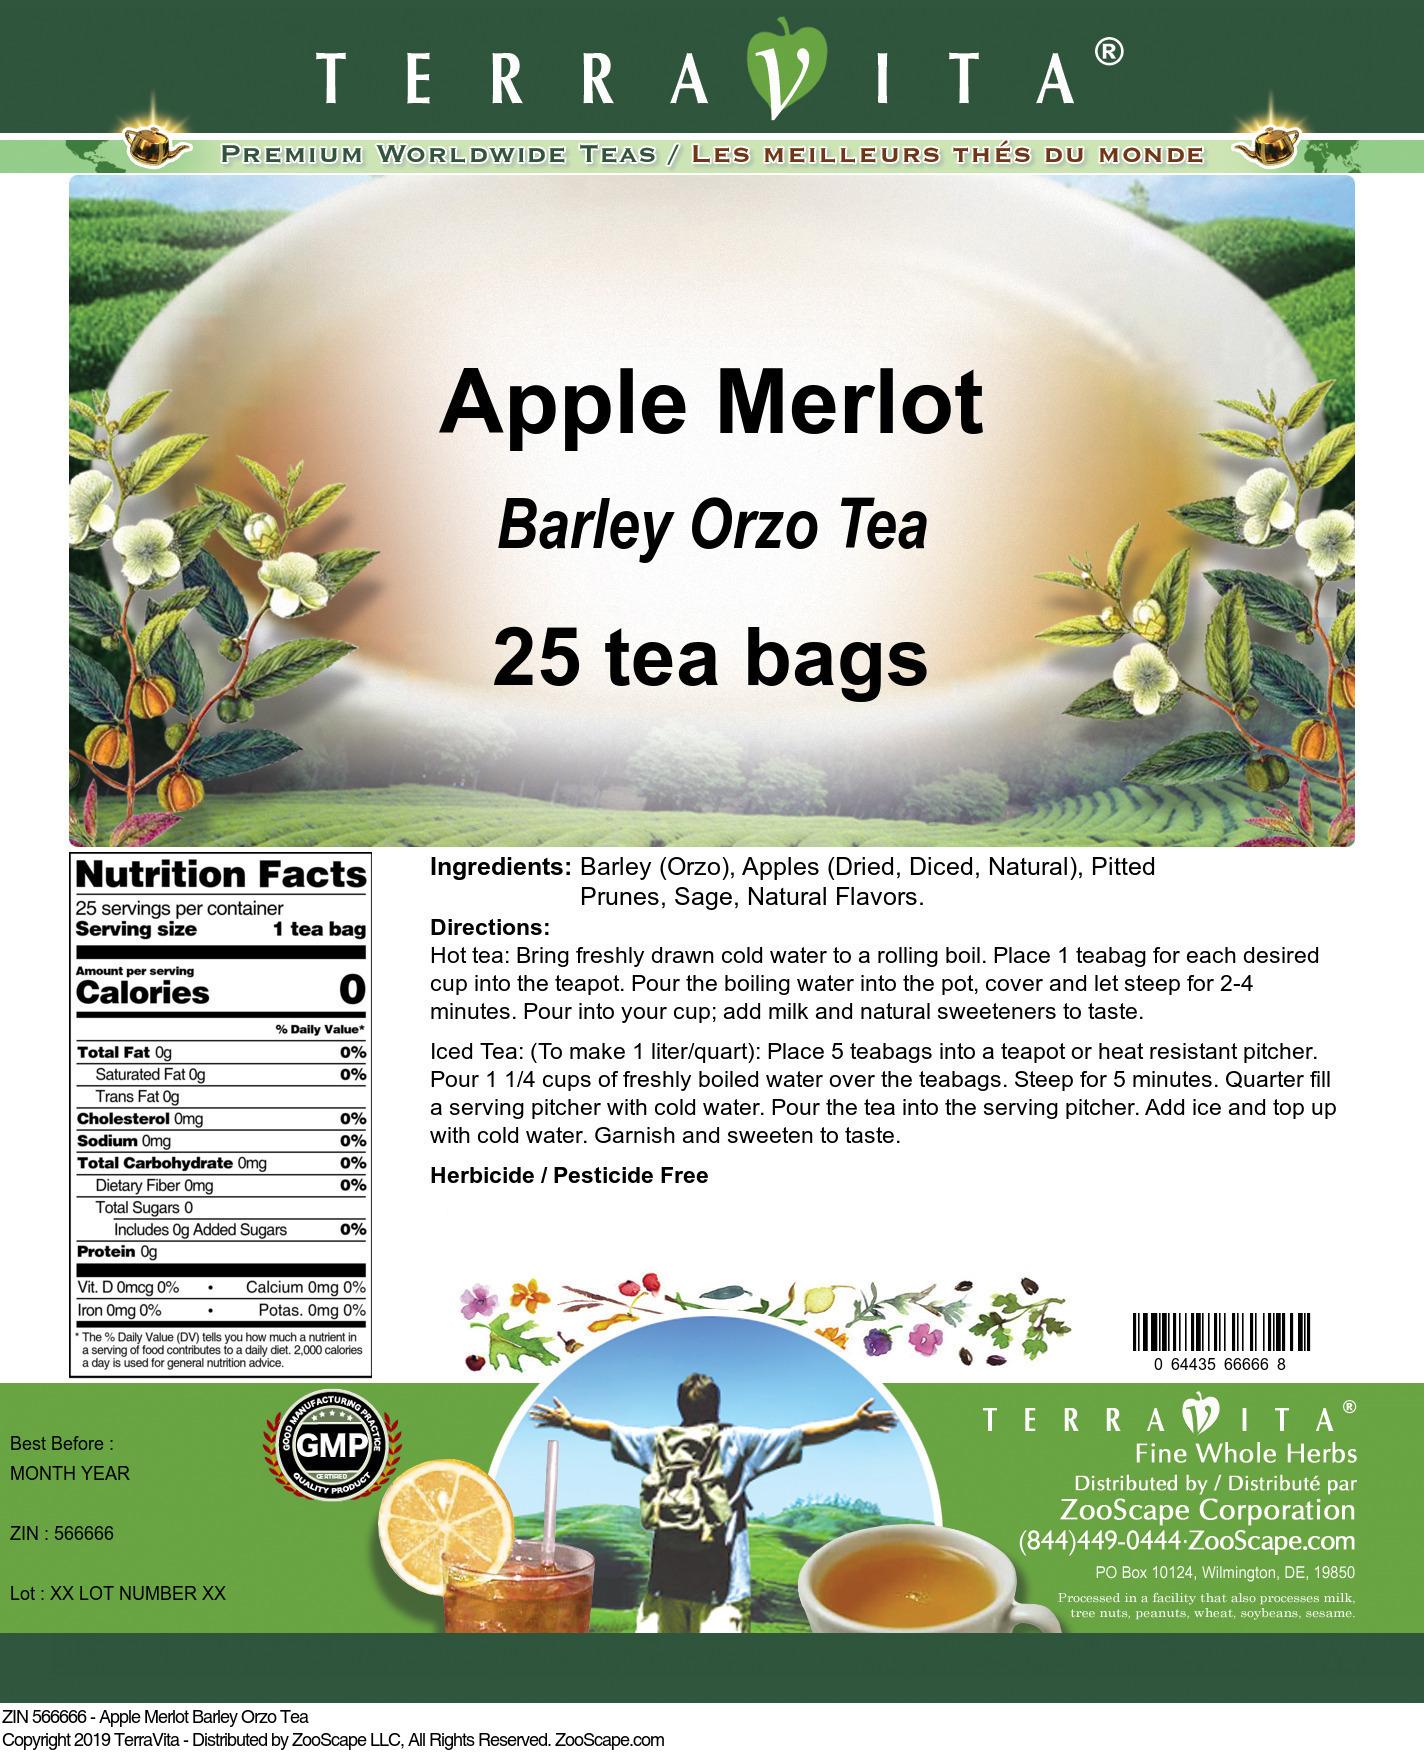 Apple Merlot Barley Orzo Tea